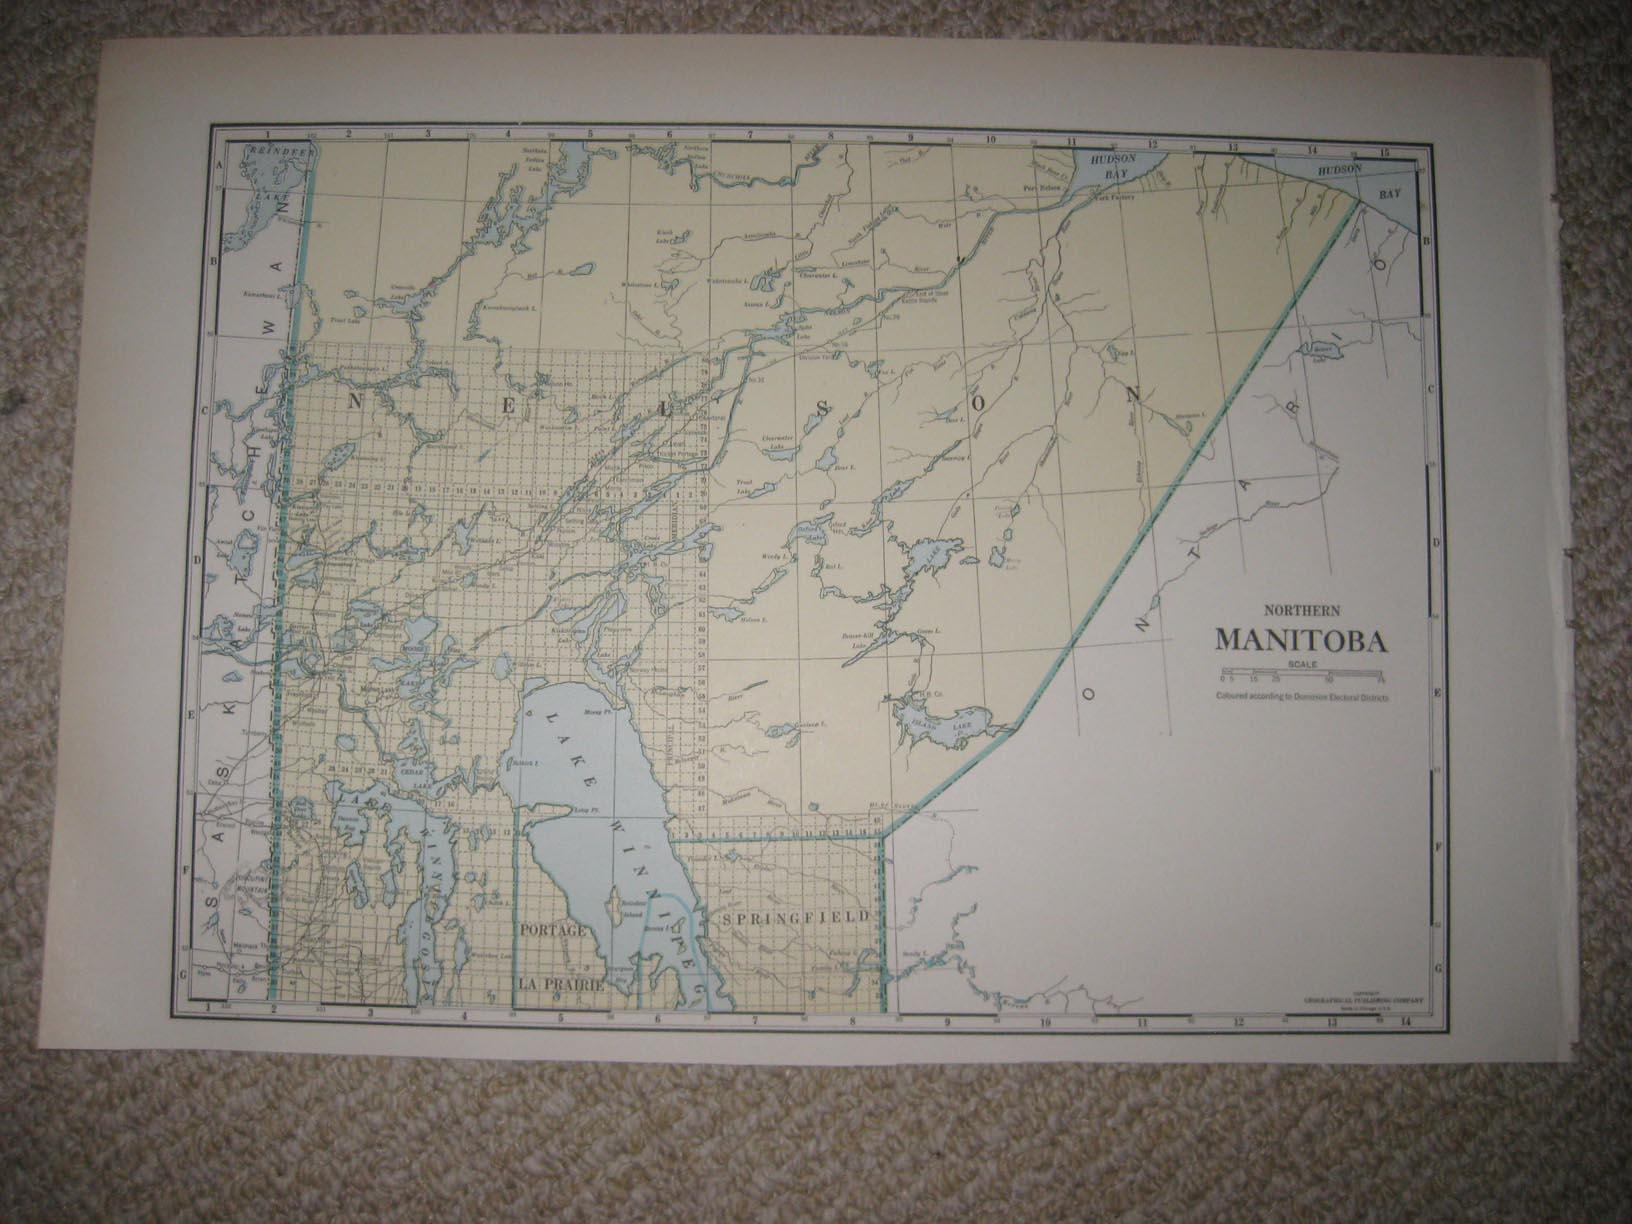 SUPERB RARE ANTIQUE 1930 NORTH NORTHERN MANITOBA CANADA MAP